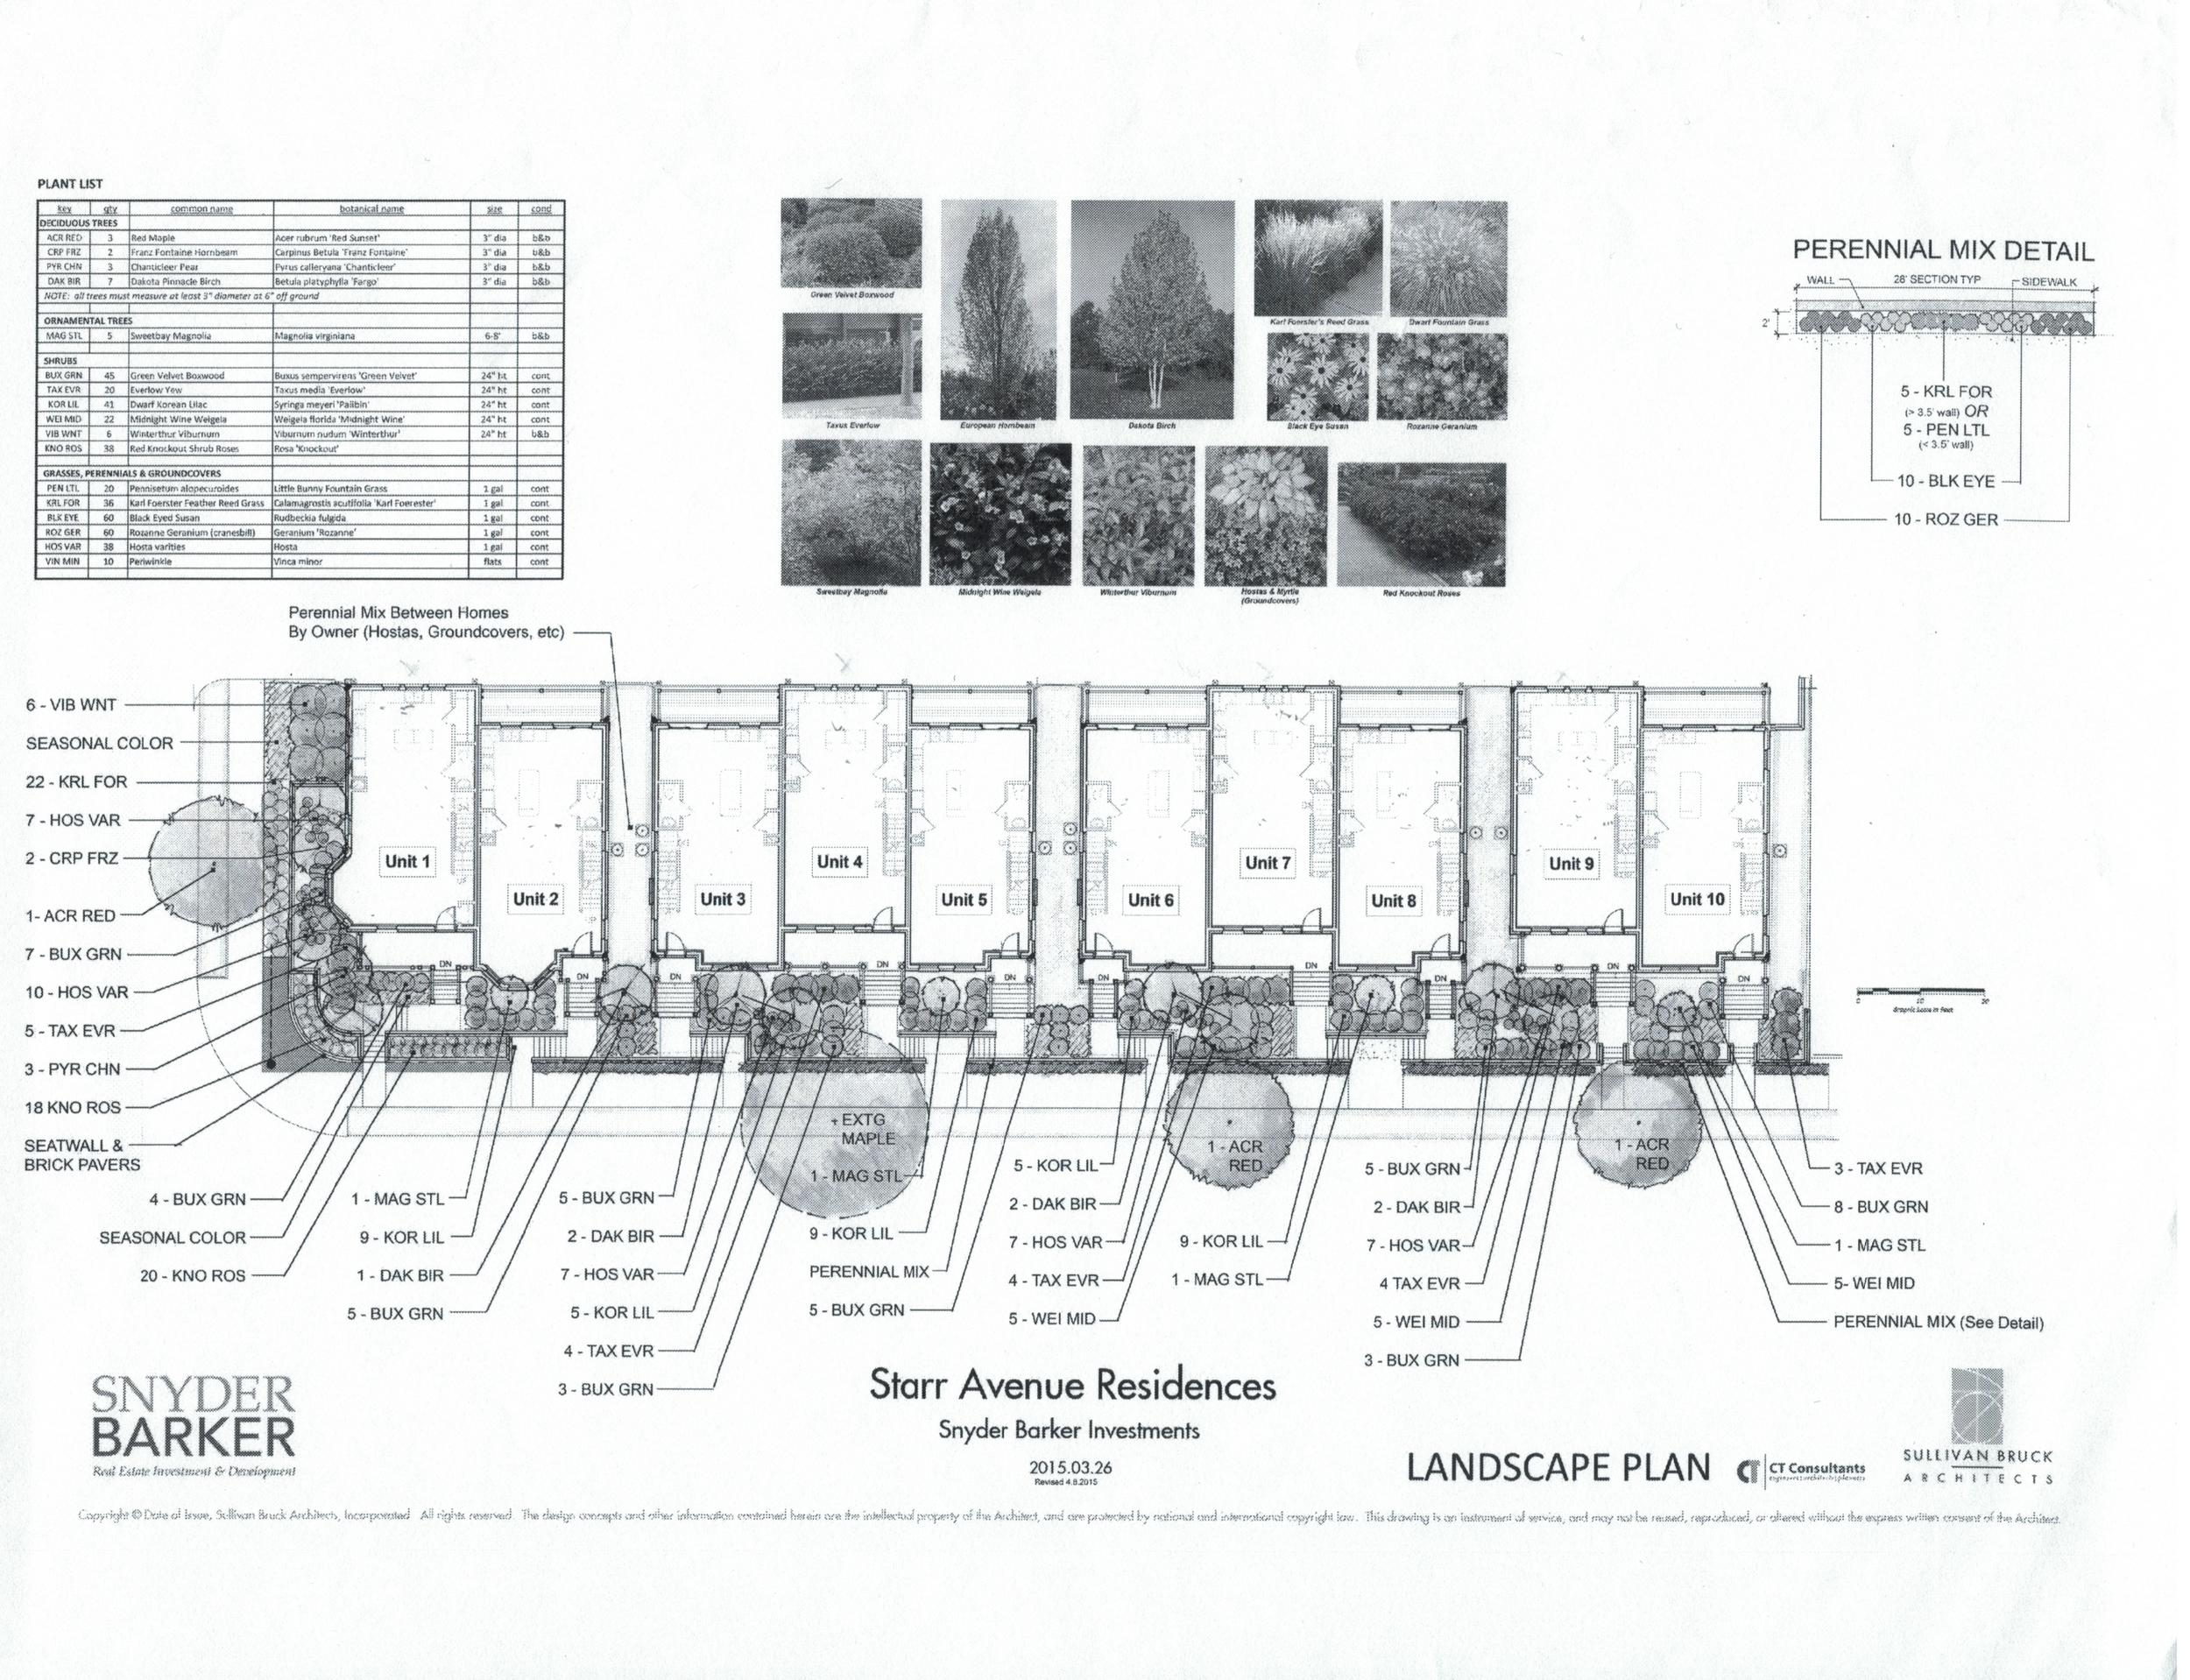 Aston_Estates_Landscape_Plan.jpg